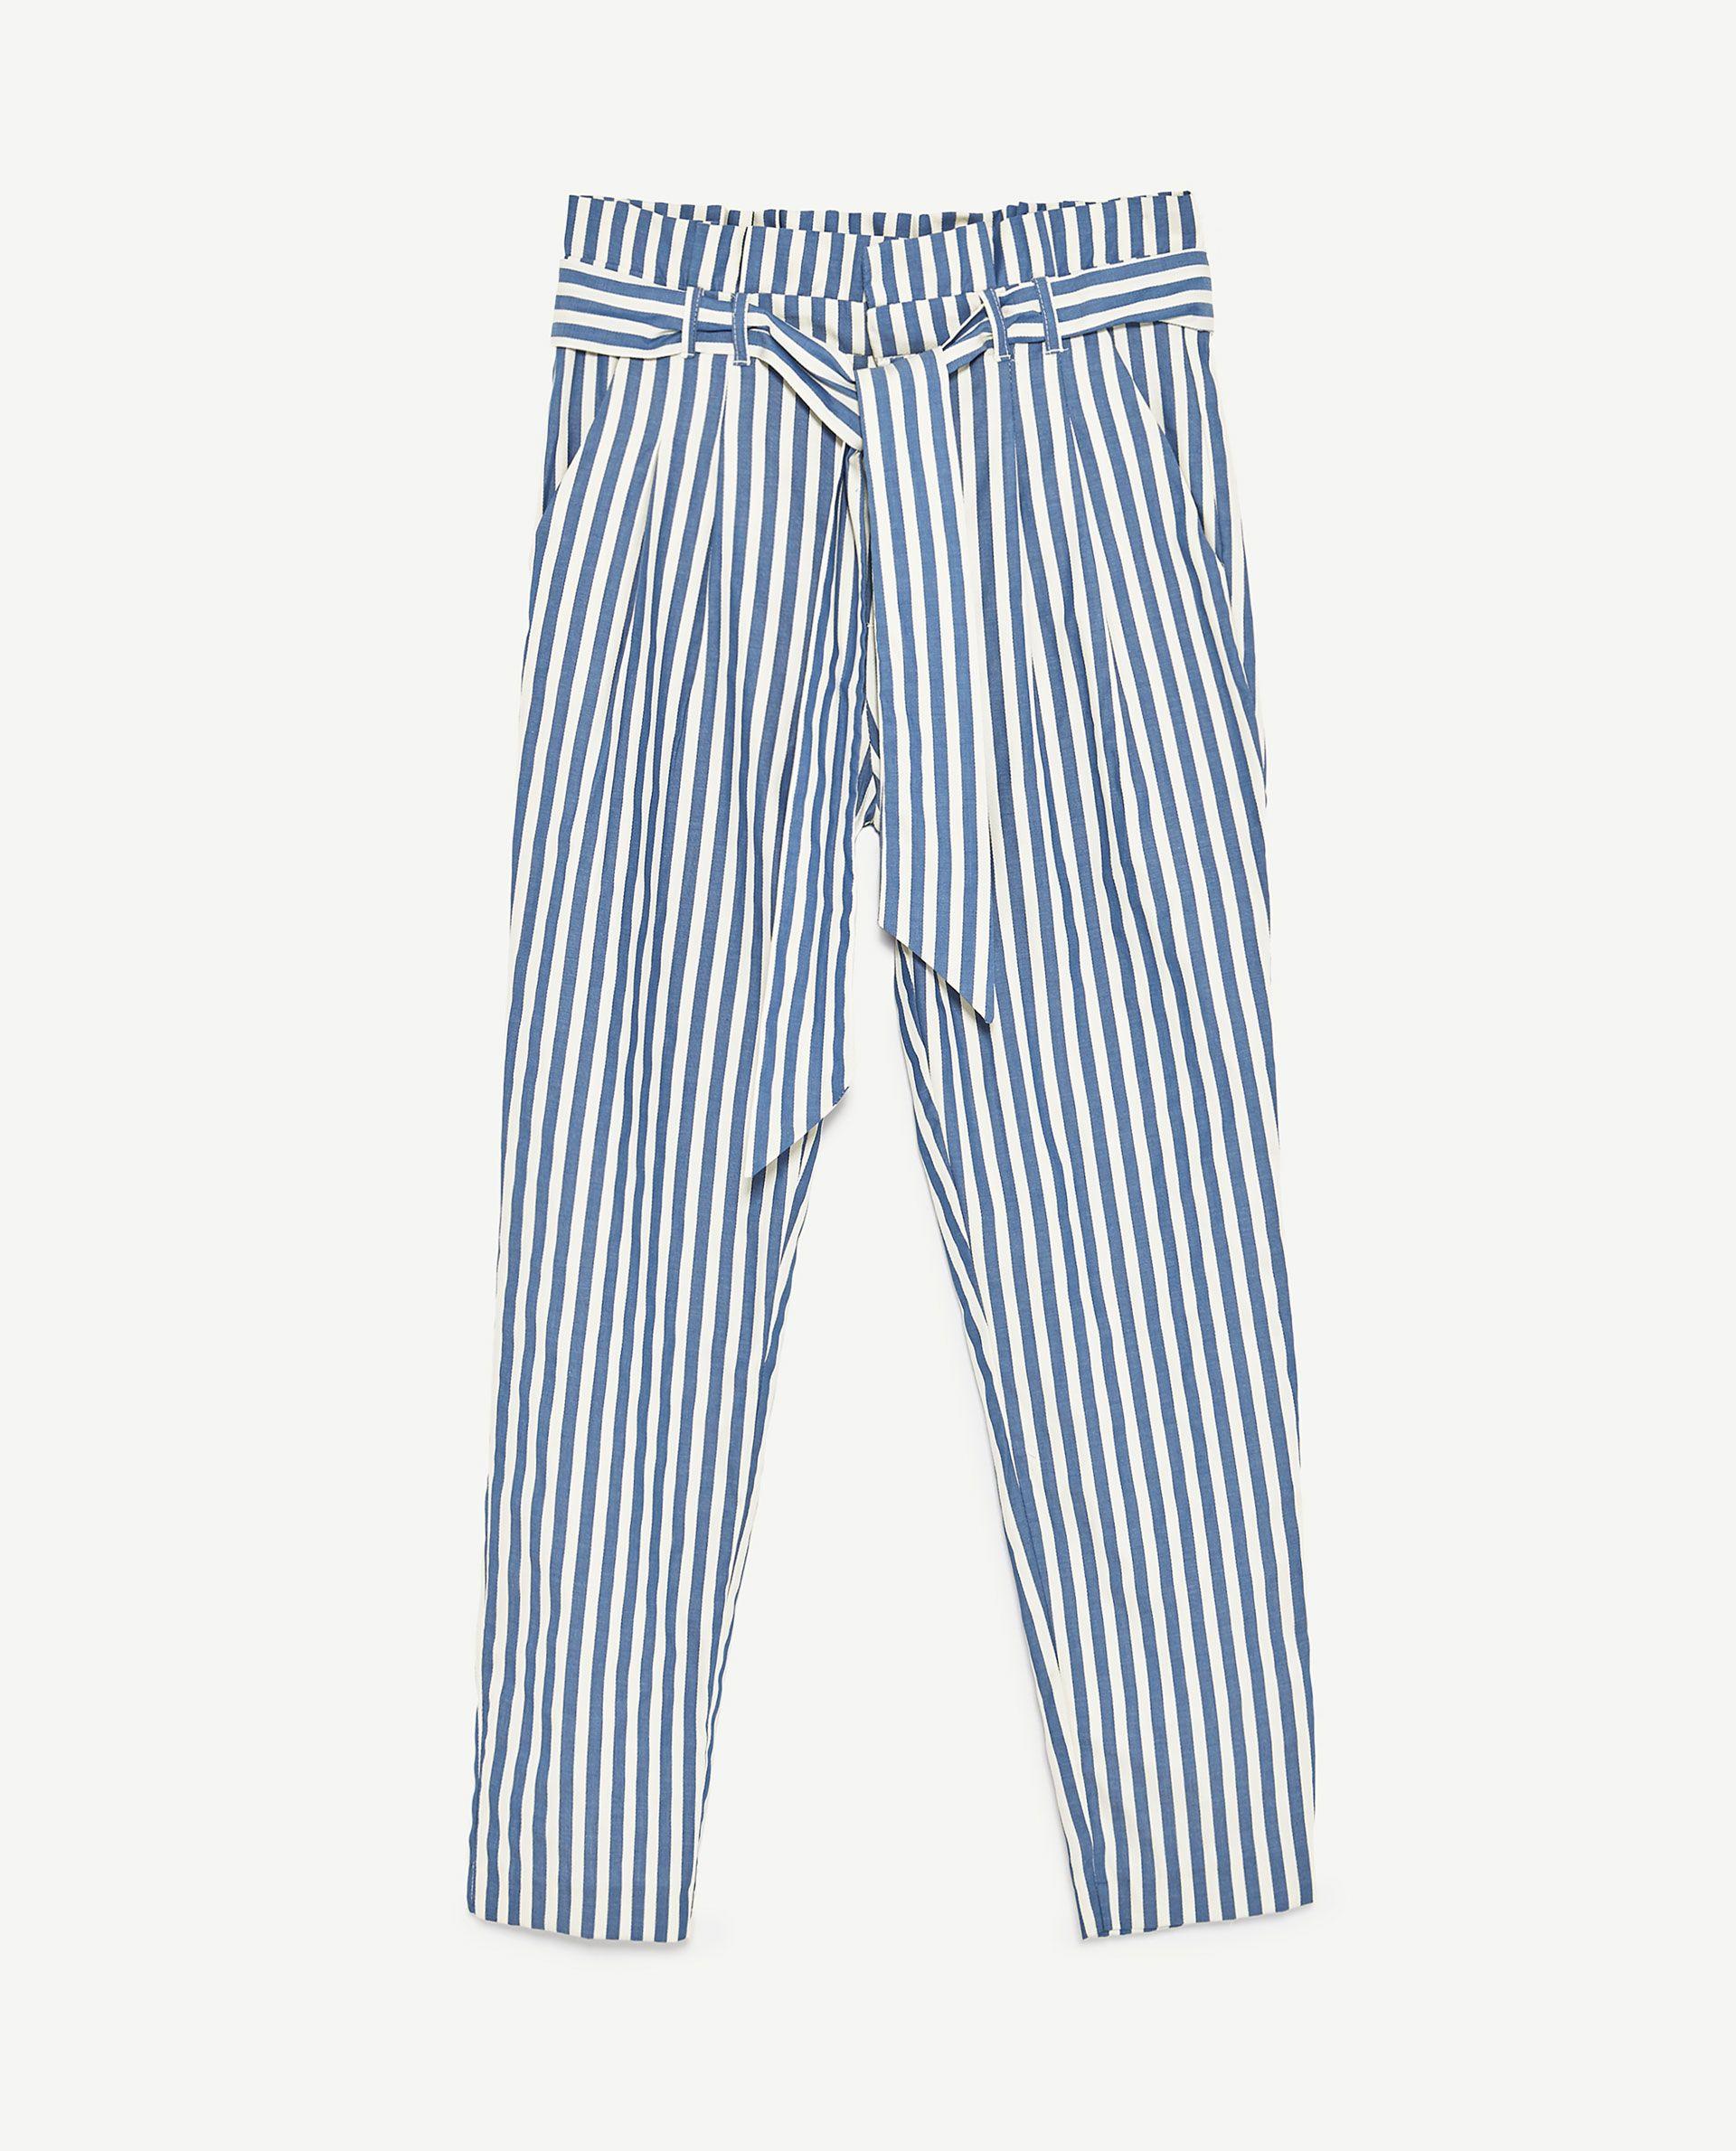 image 8 de pantalon rayures de zara w i s h l i s t. Black Bedroom Furniture Sets. Home Design Ideas